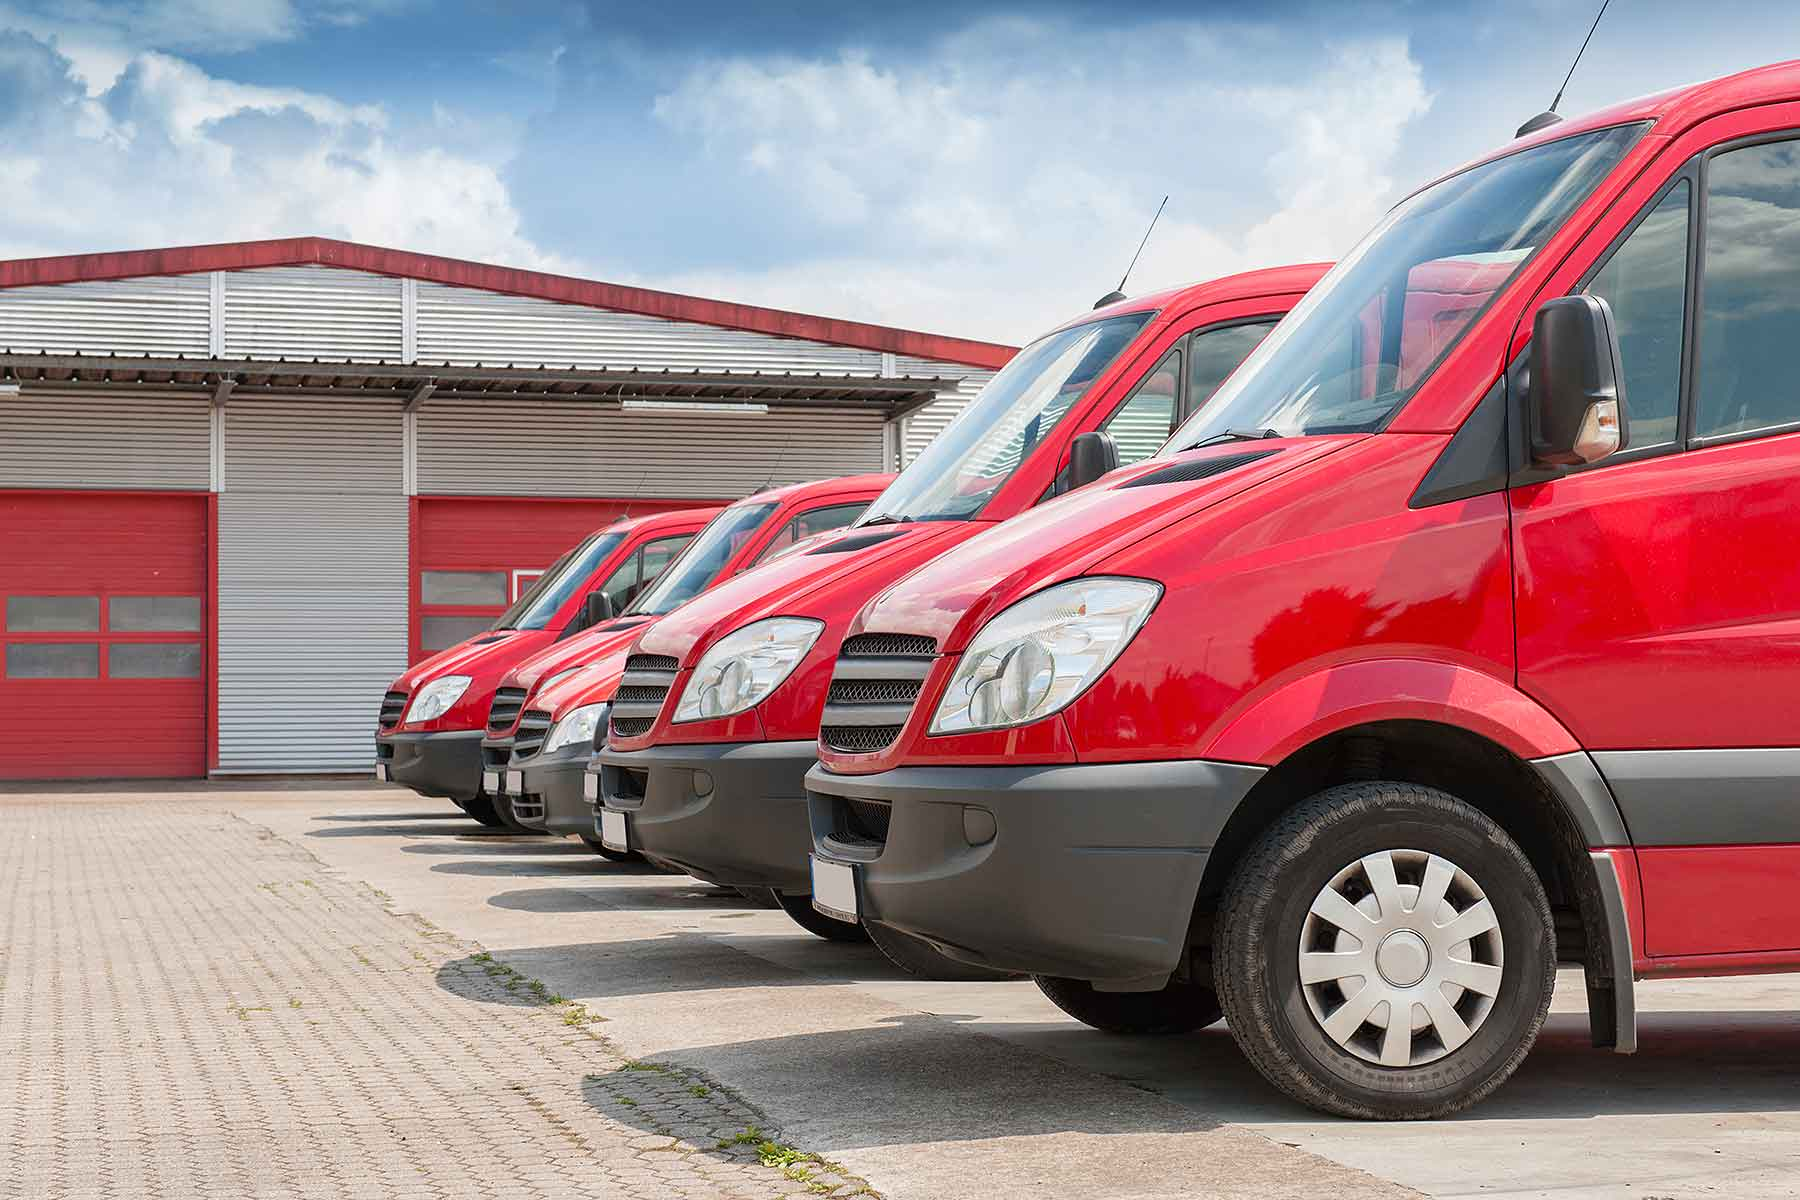 Car park of vans